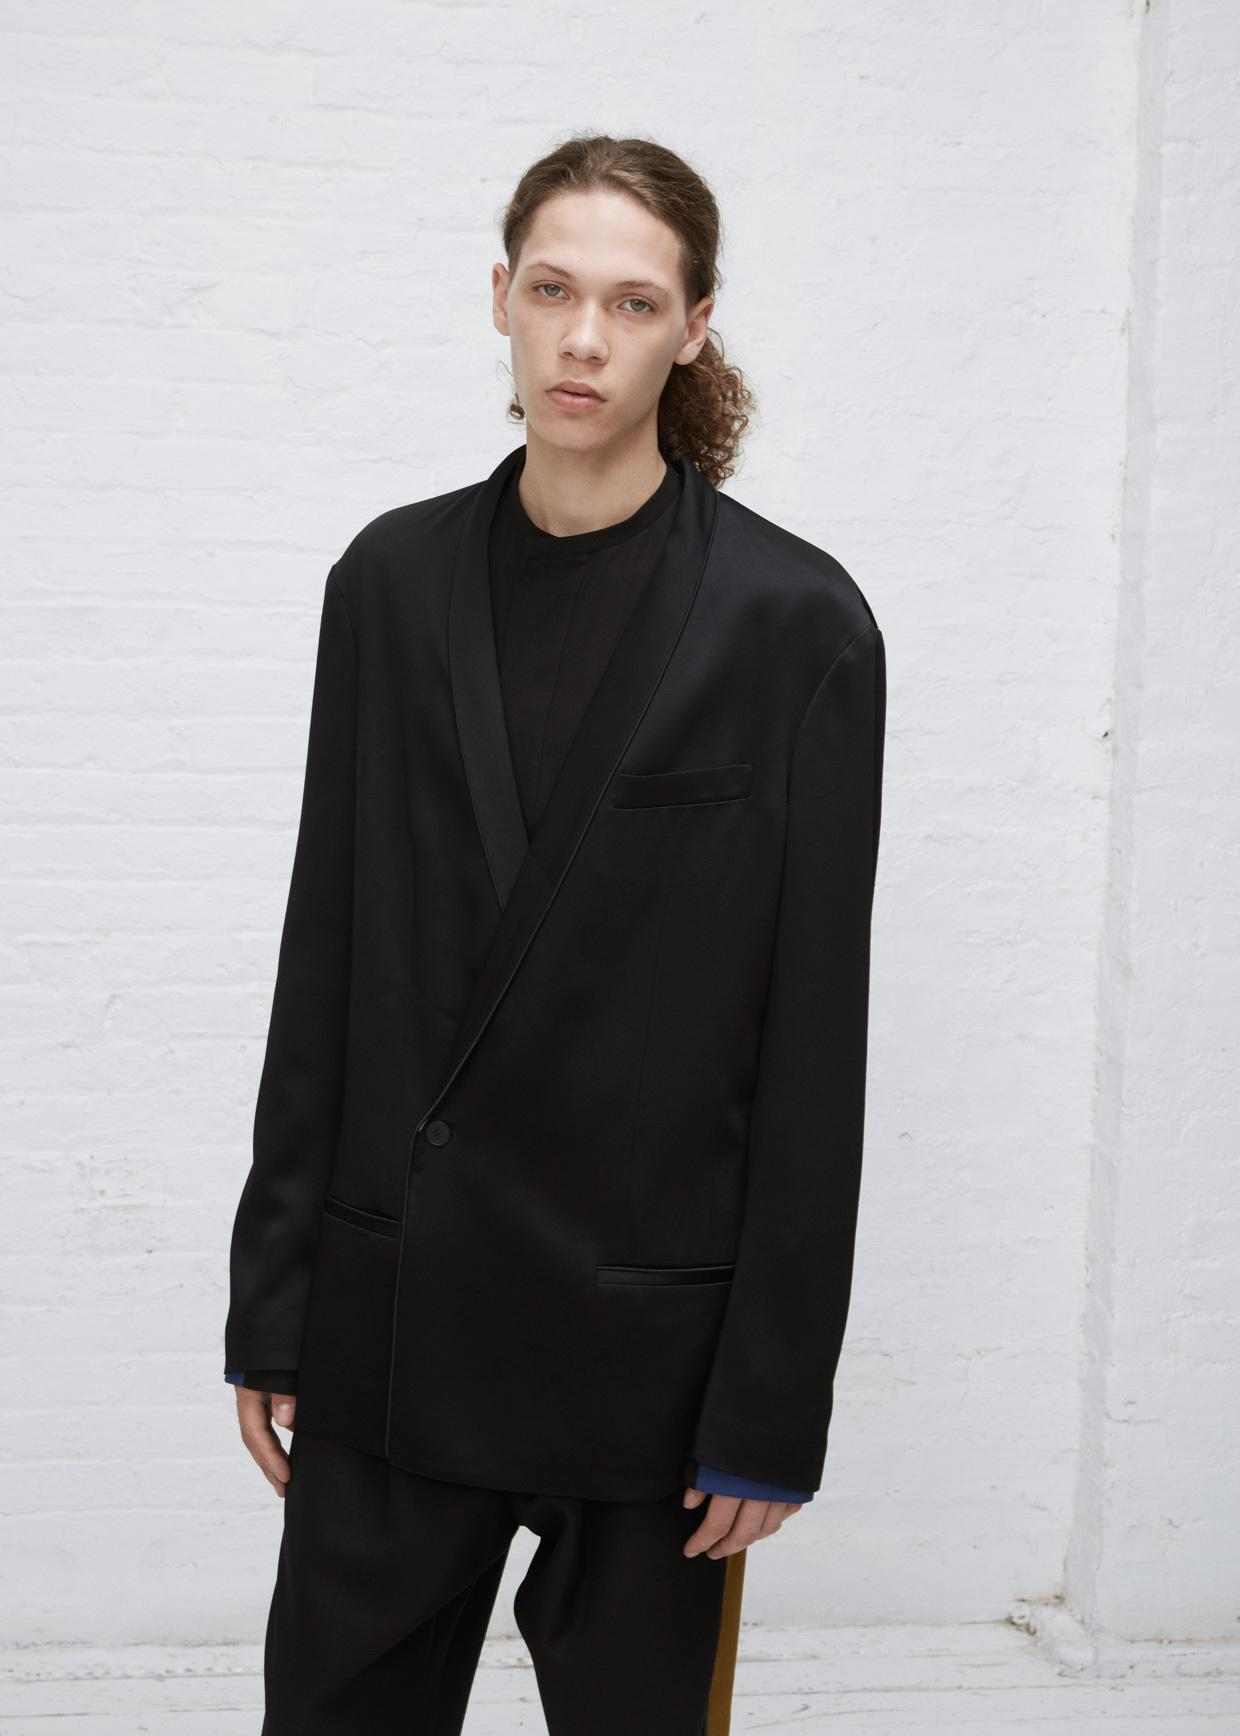 lyst haider ackermann black ivory oversized blazer in black for men. Black Bedroom Furniture Sets. Home Design Ideas